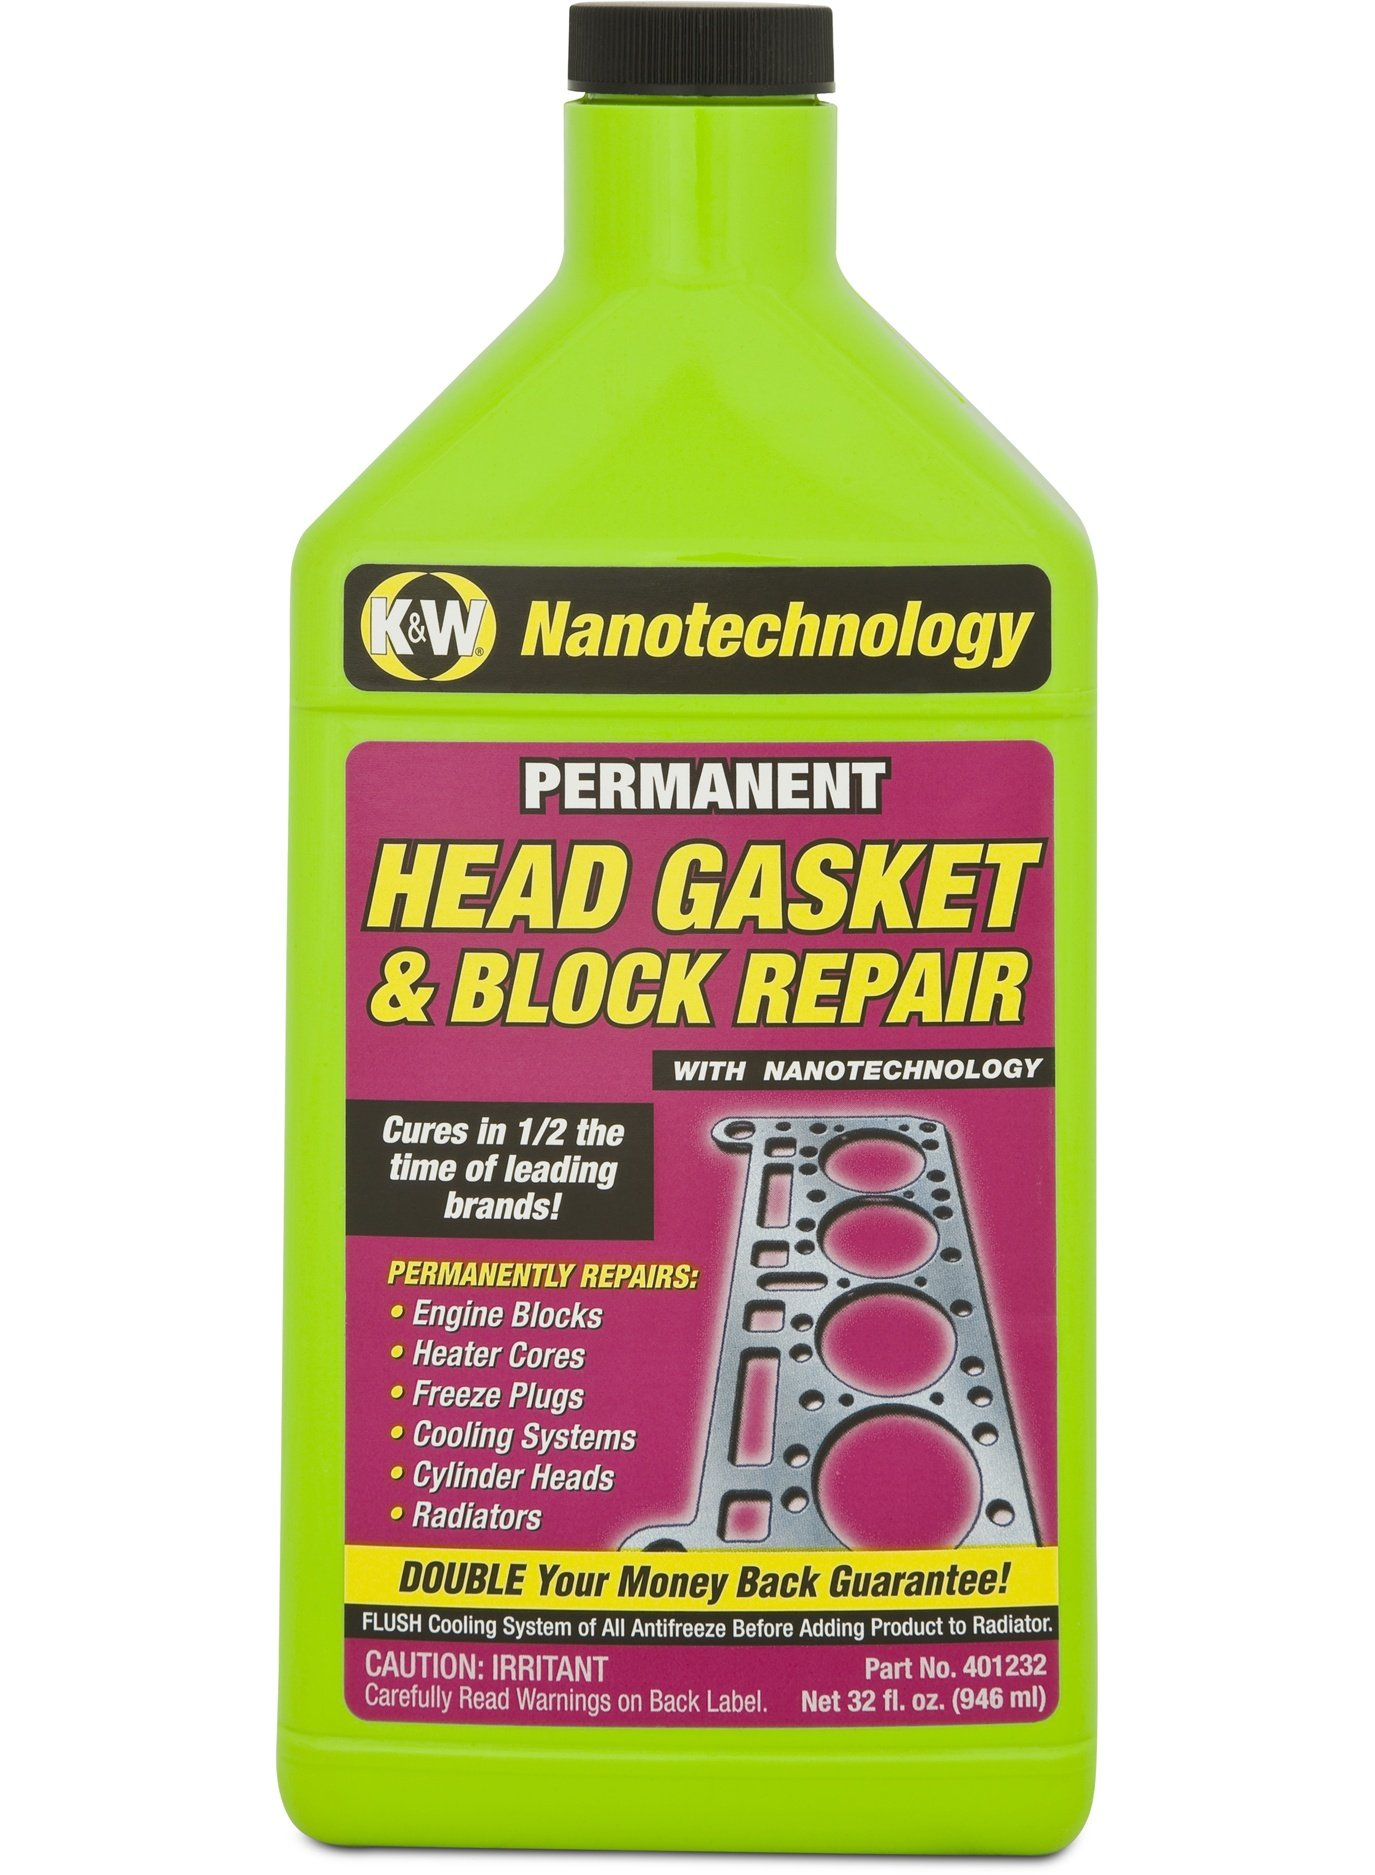 K&W 401232 Permanent Head Gasket & Block Repair with Nanotechnology - 32 Fl Oz